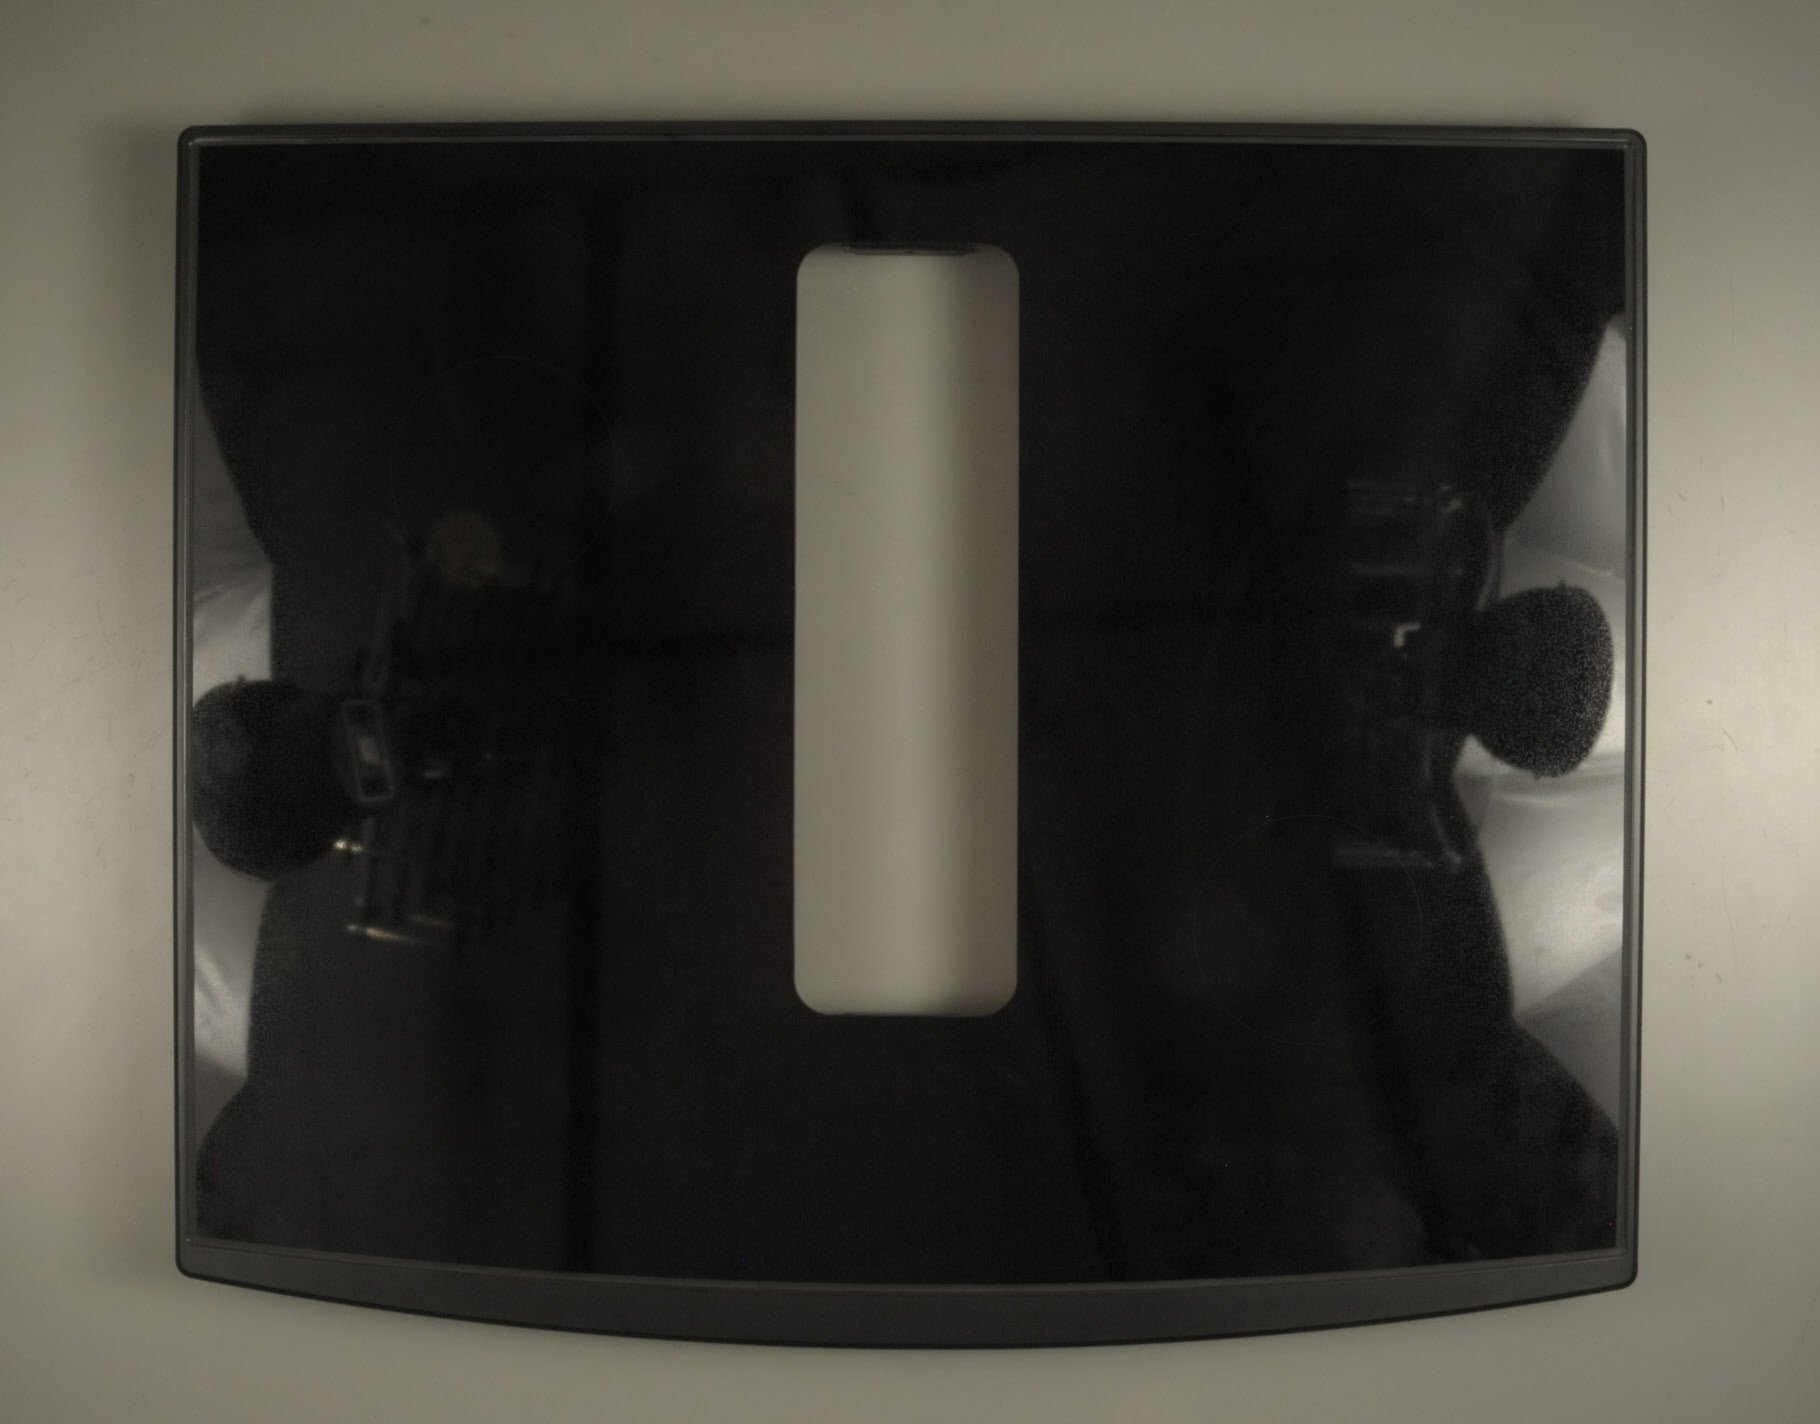 12002557 Jenn Air Range Stove Oven Part -Glass Main Top